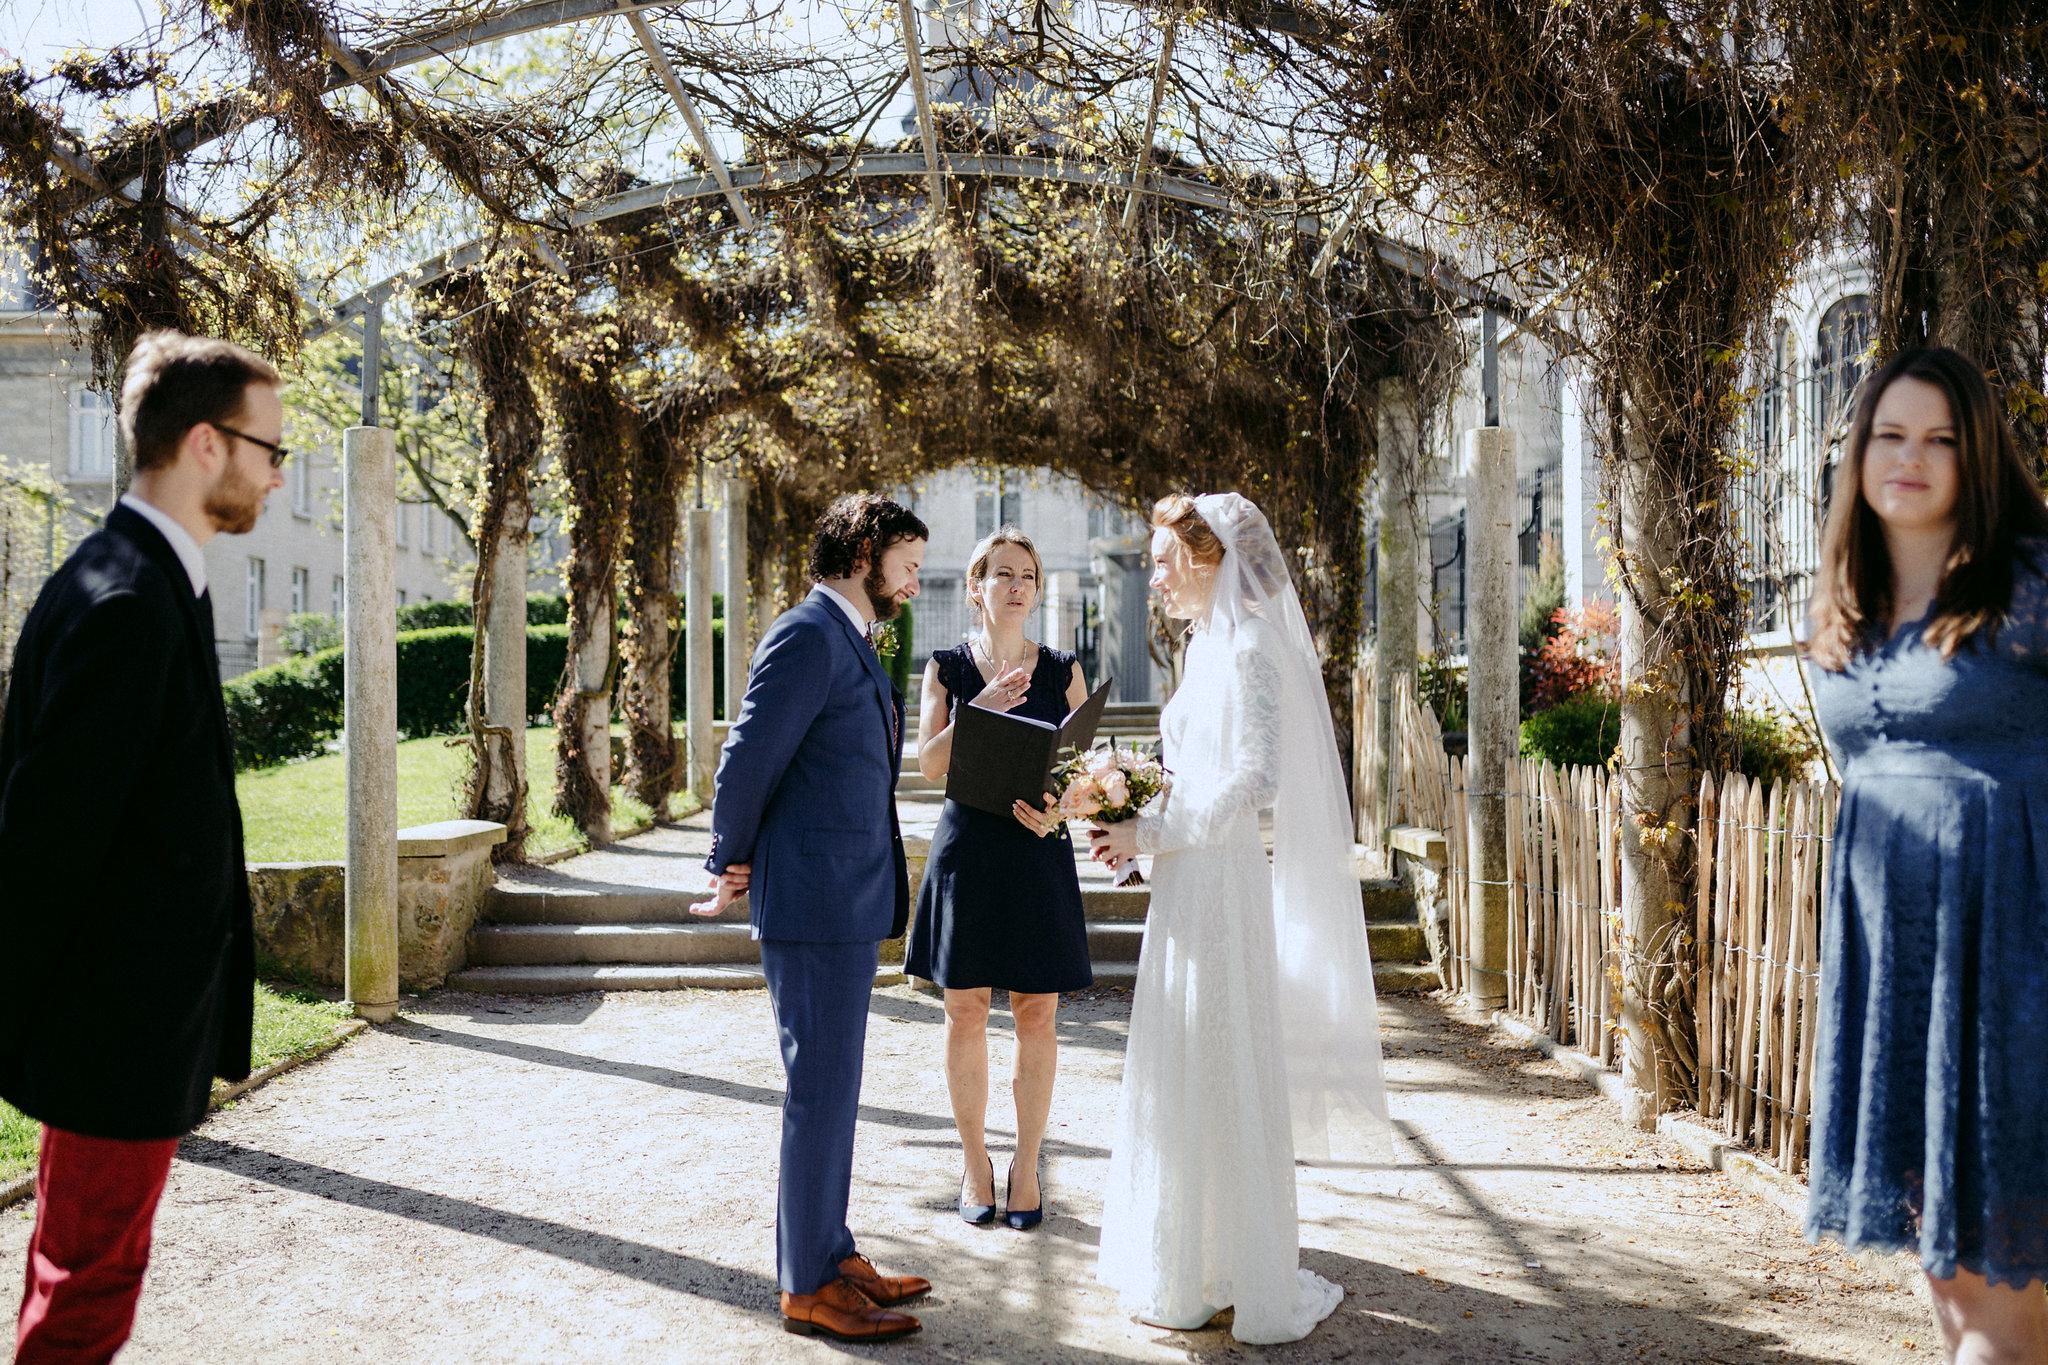 Paris_elopement_wedding_photographer-150.jpg